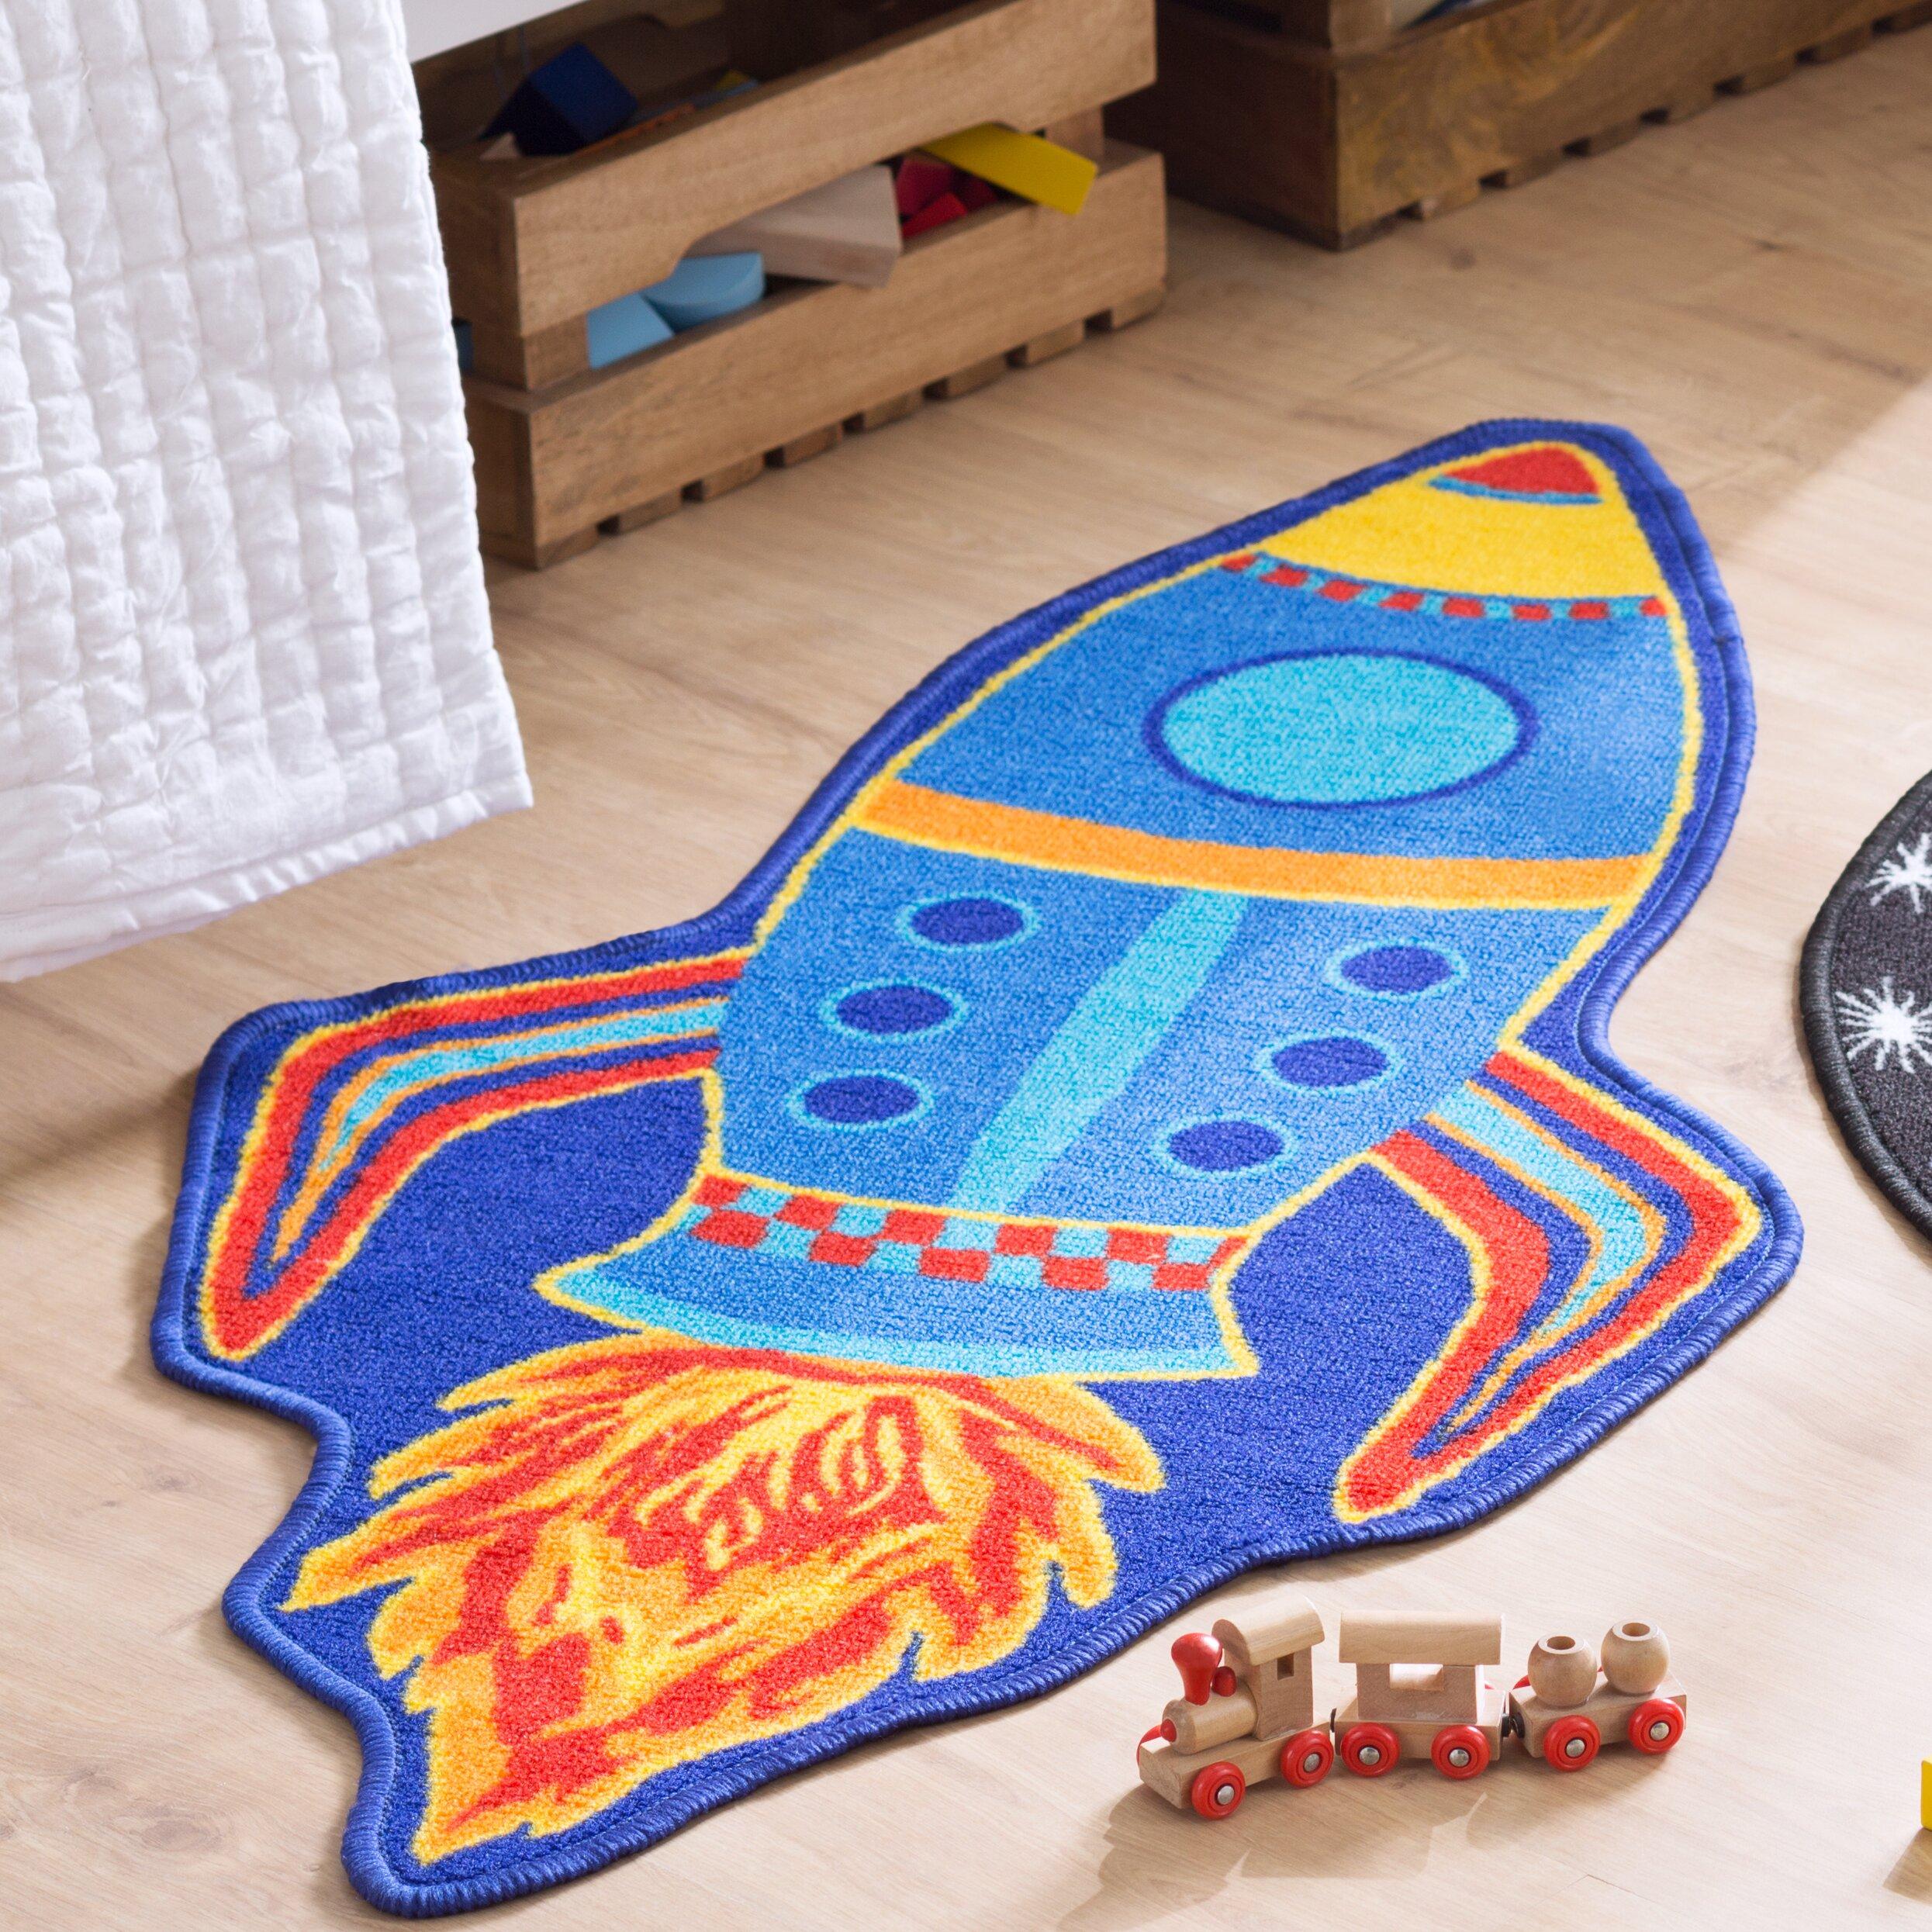 Kids Childrens Football Field 100 X 133cm: Brook Lane Rugs Bambino Rocket Blue Area Rug & Reviews